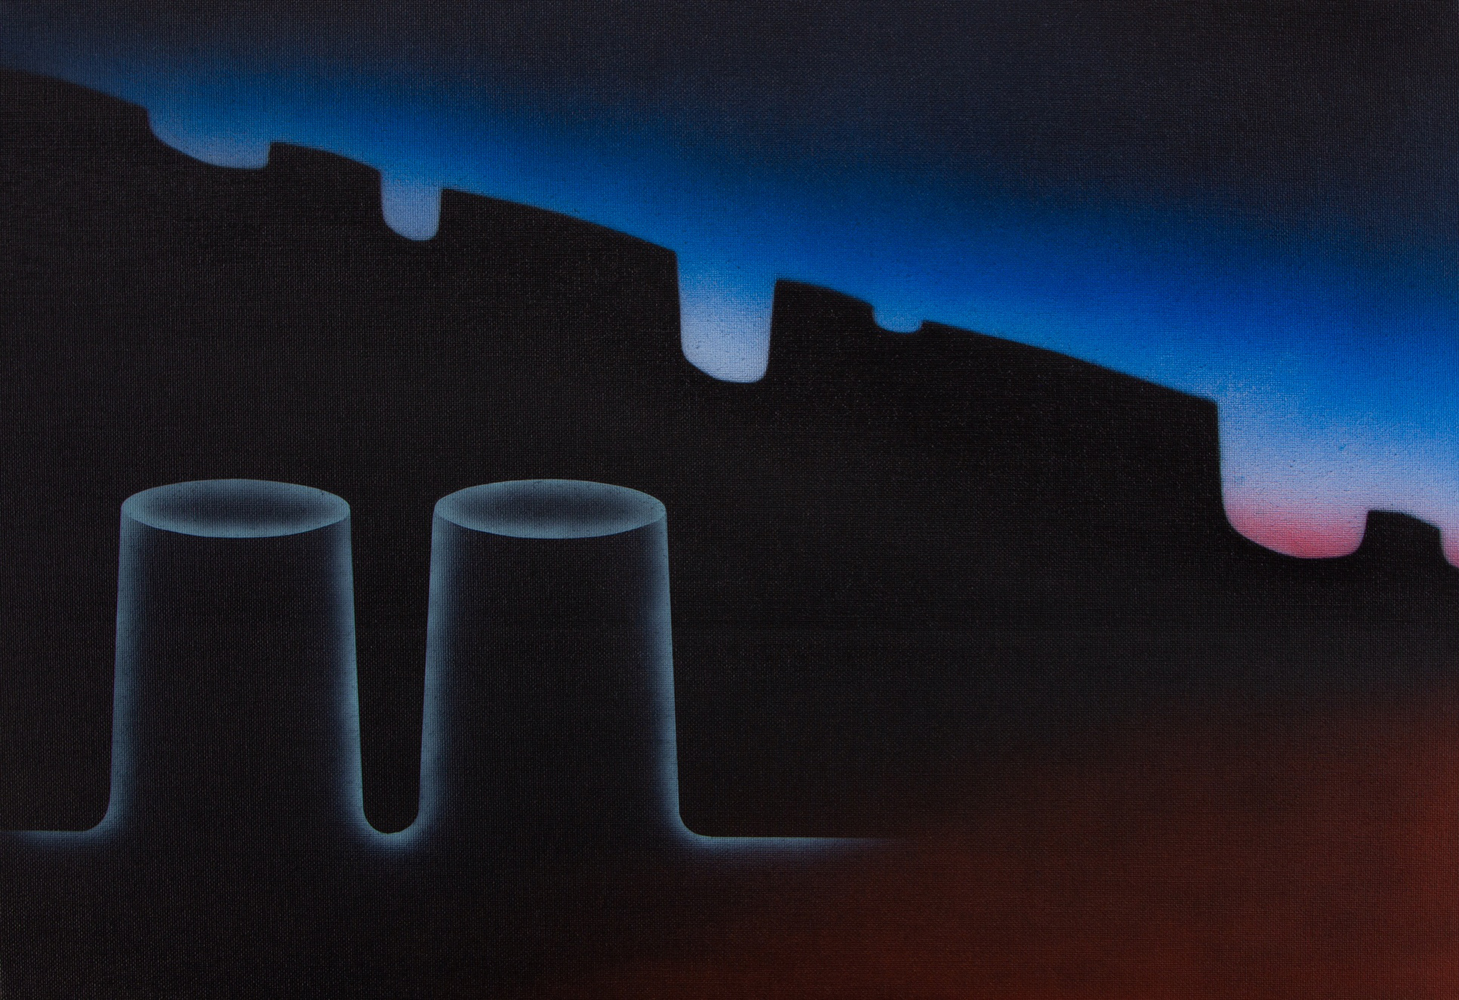 Matt Sellars, Infrastrucure, 2021, acrylic on canvas, 16 x 23 inches, $2000.